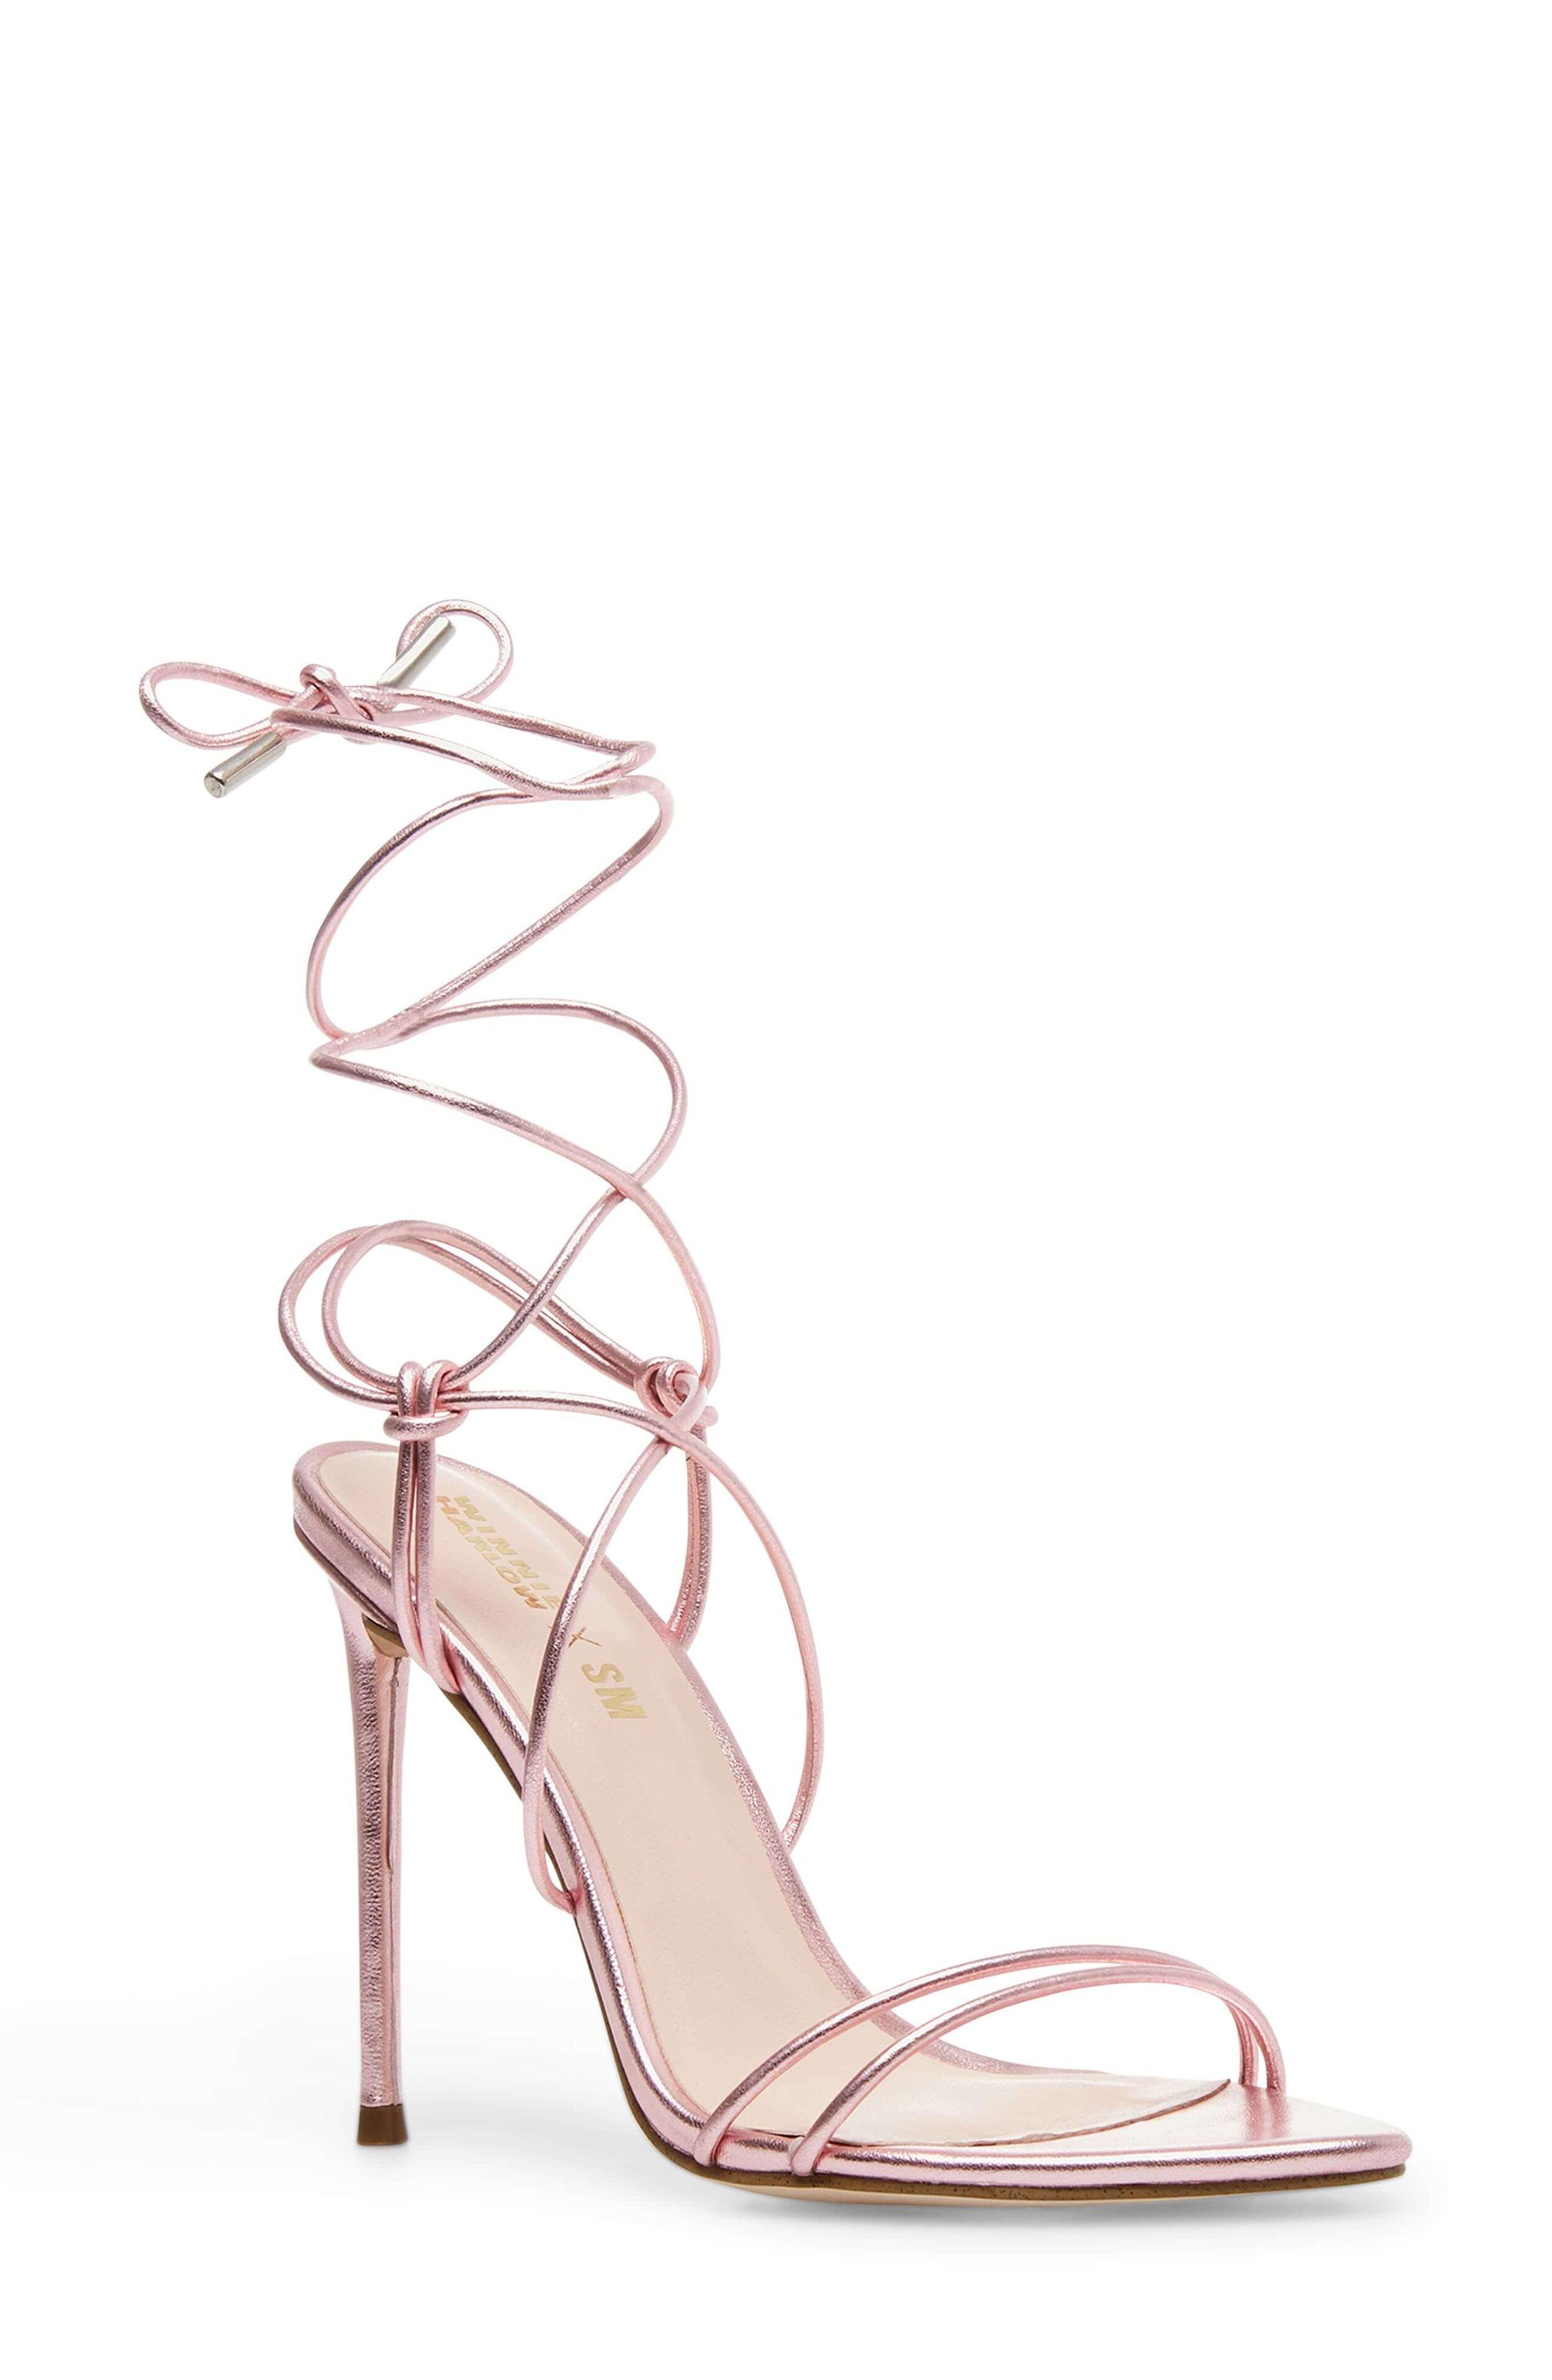 Winnie Harlow X Steve Madden Badgirl Ankle Wrap Stiletto Sandal